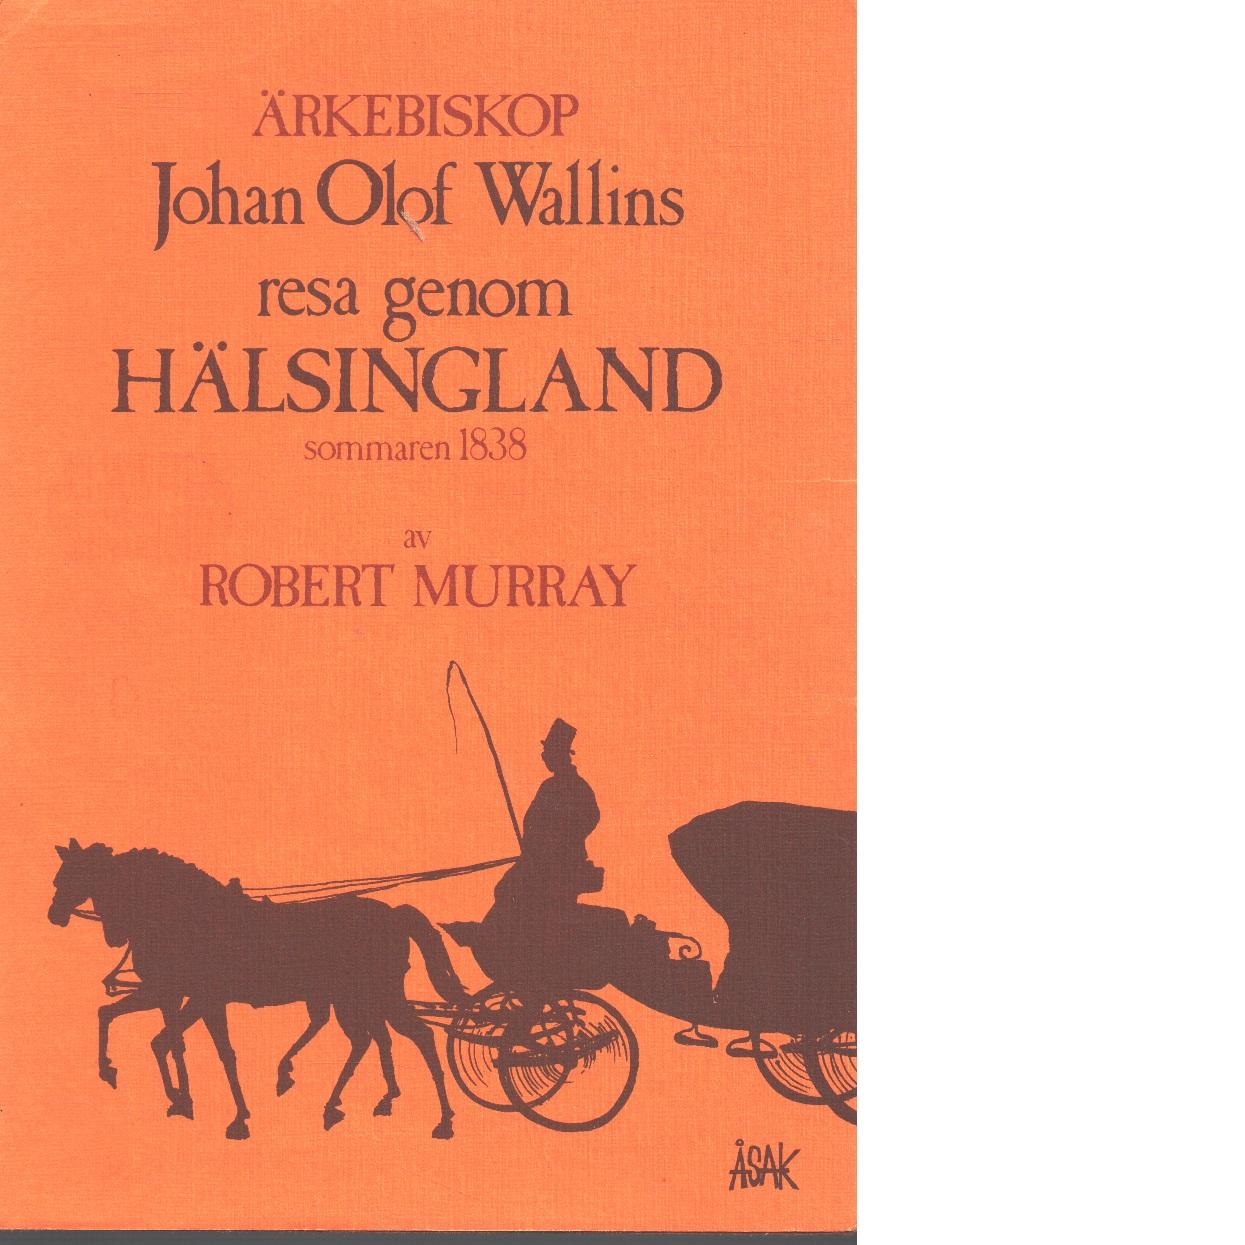 Ärkebiskop Johan Olof Wallins resa genom Hälsingland sommaren 1838 - Murray, Robert